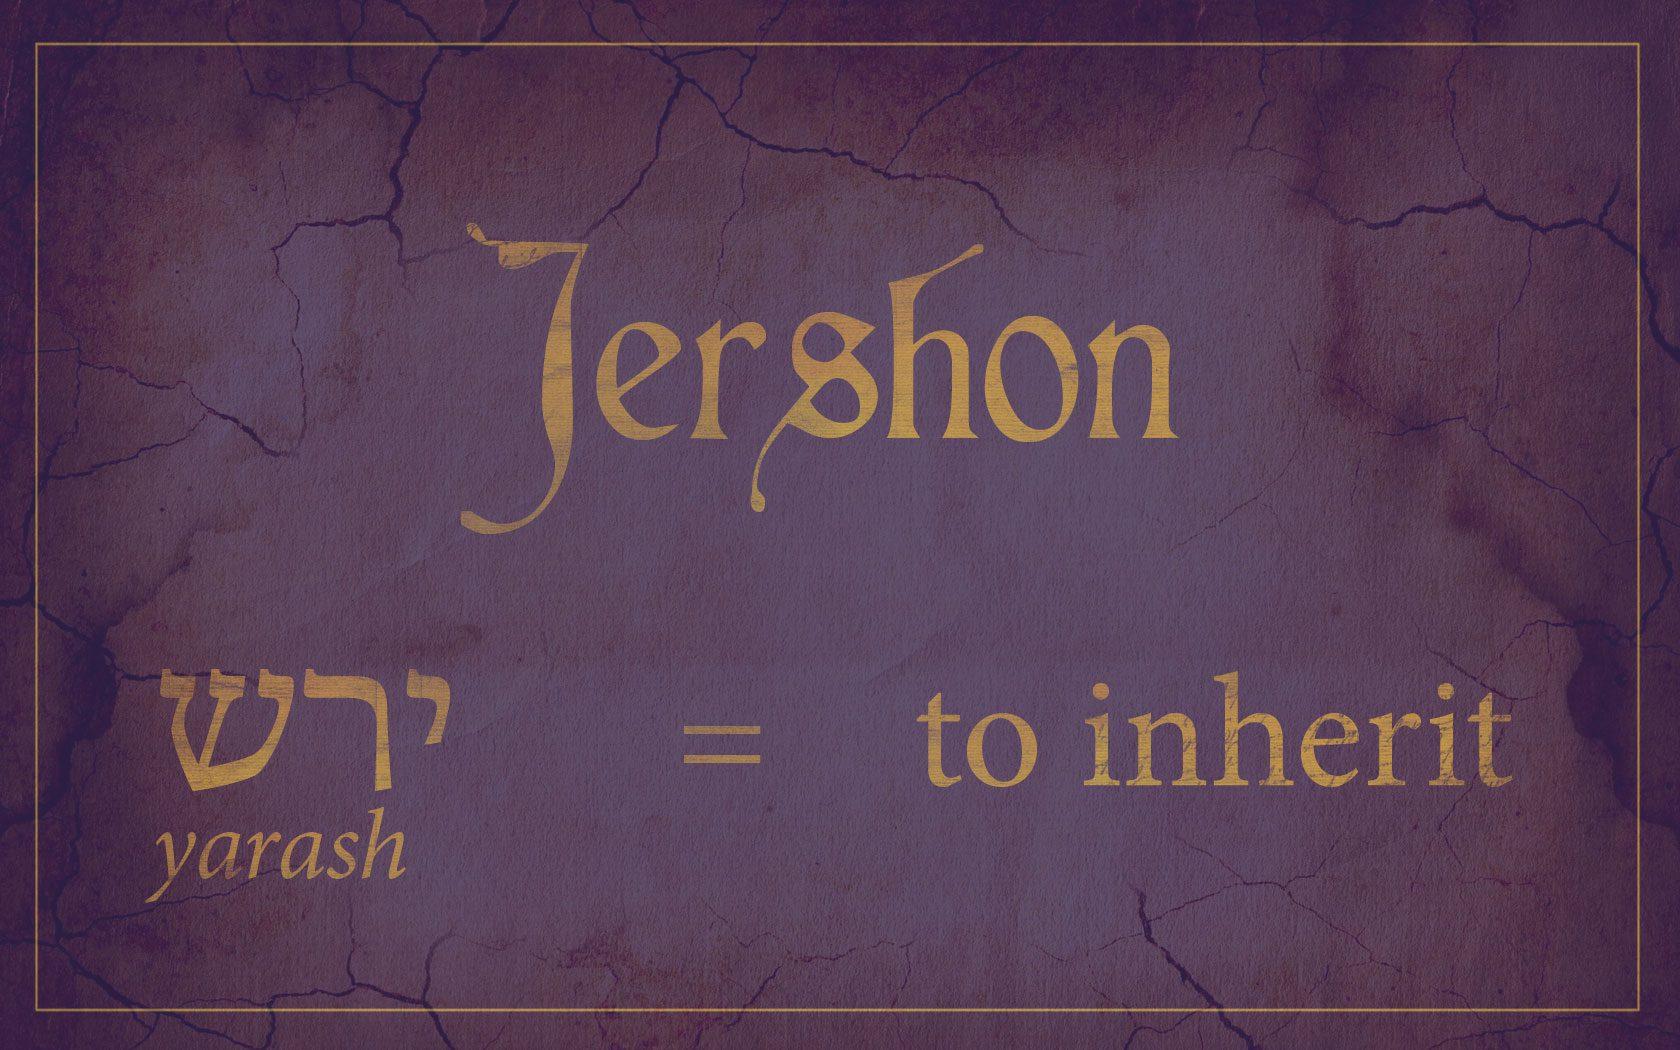 jershon-etymology